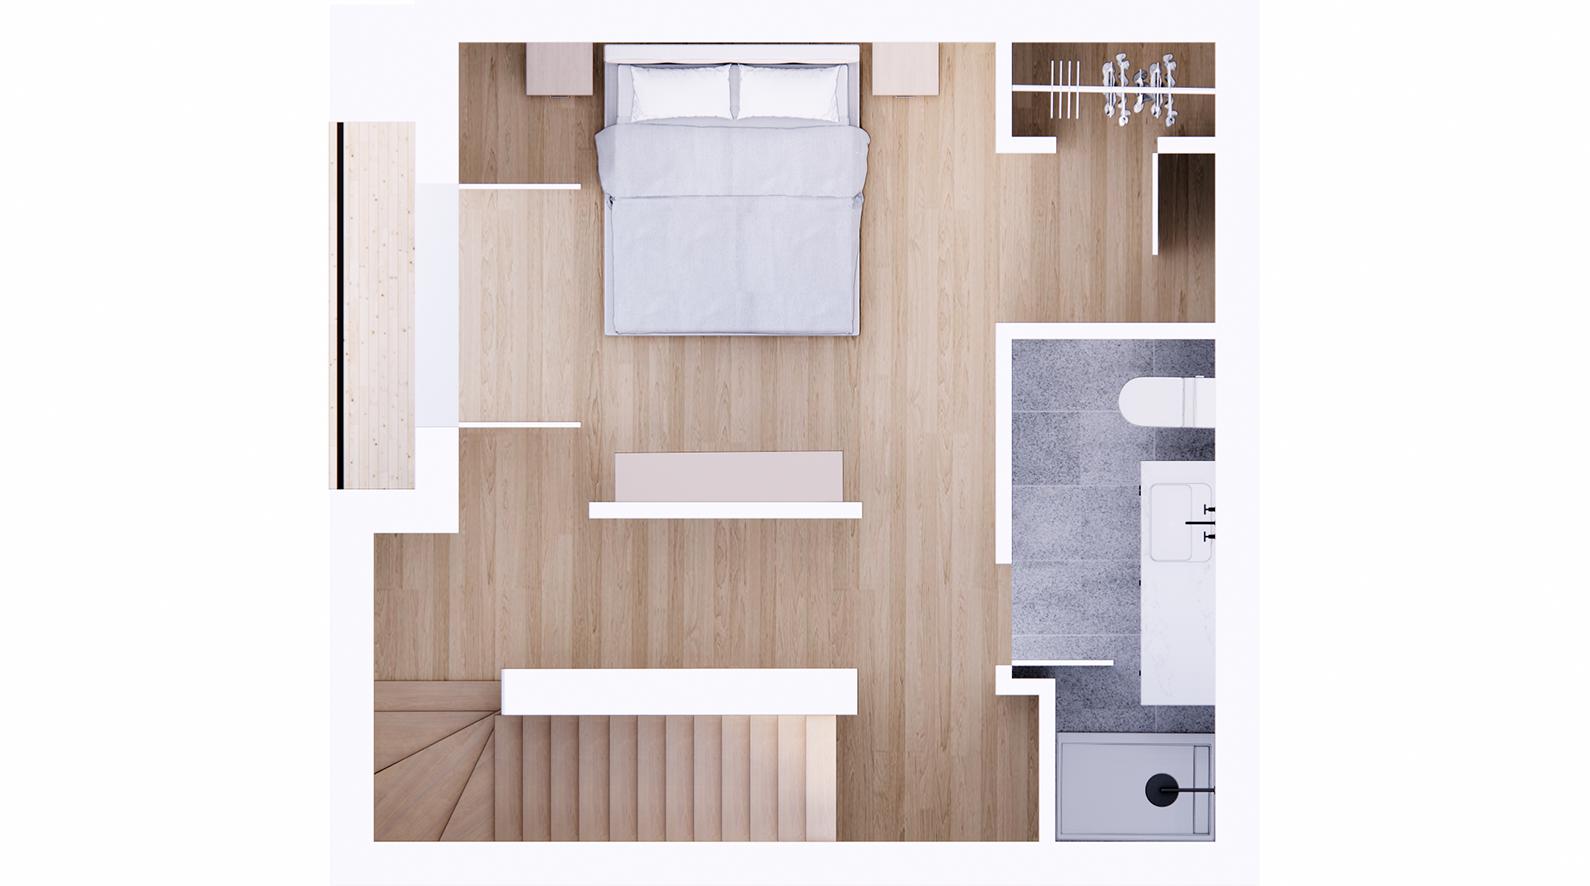 Humaco_Maison5_Plan-niveau 31 (3)